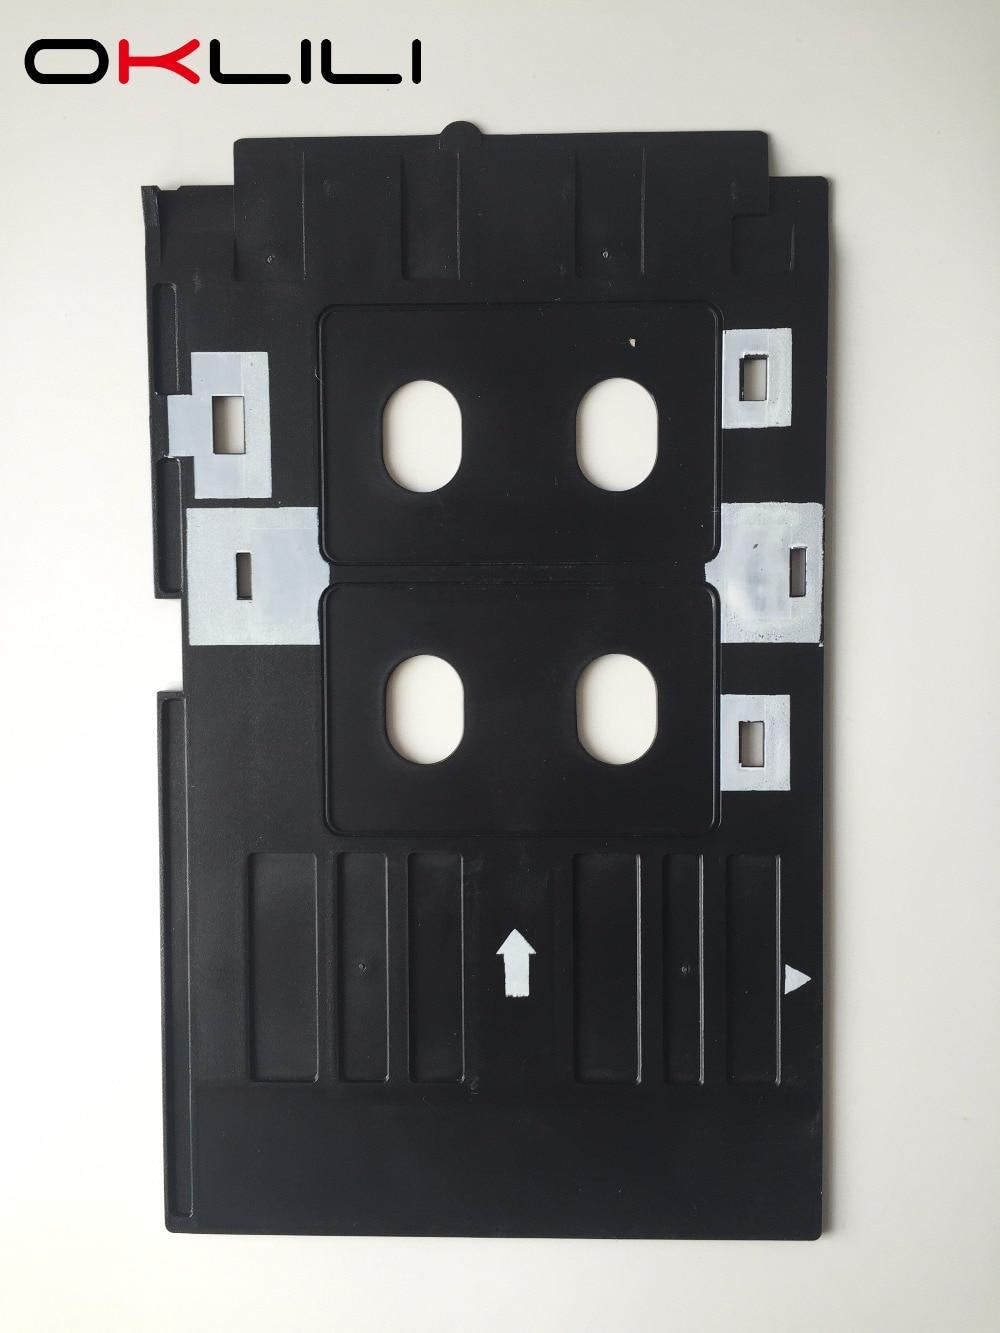 Printer Supplies Ink Way 25pcs Pvc Id Card Tray For R260 R265 R270 R280 R290 R380 R390 Rx680 T50 T60 A50 P50 L800 L801 R330 Office Electronics